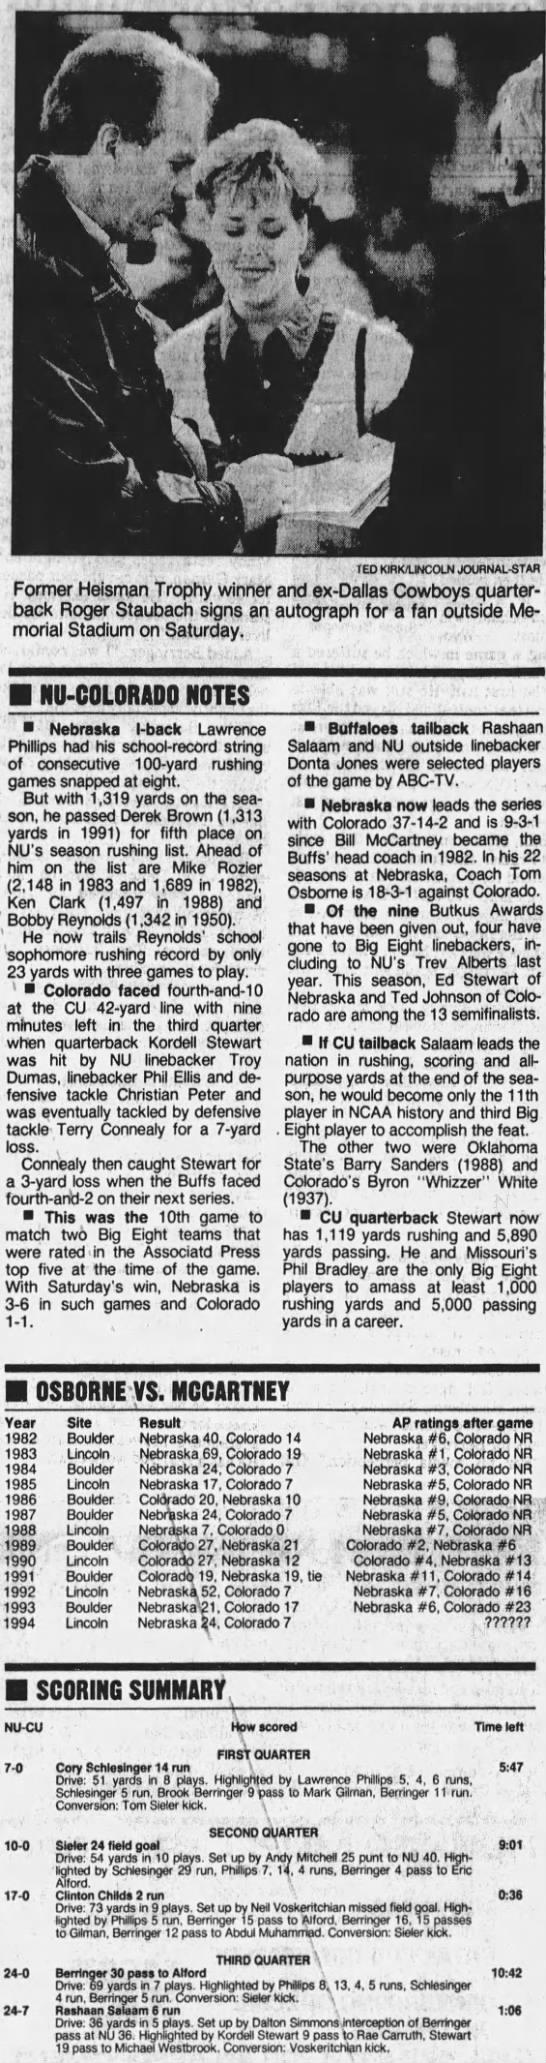 1994 Nebraska-Colorado, LJS notes & summary -